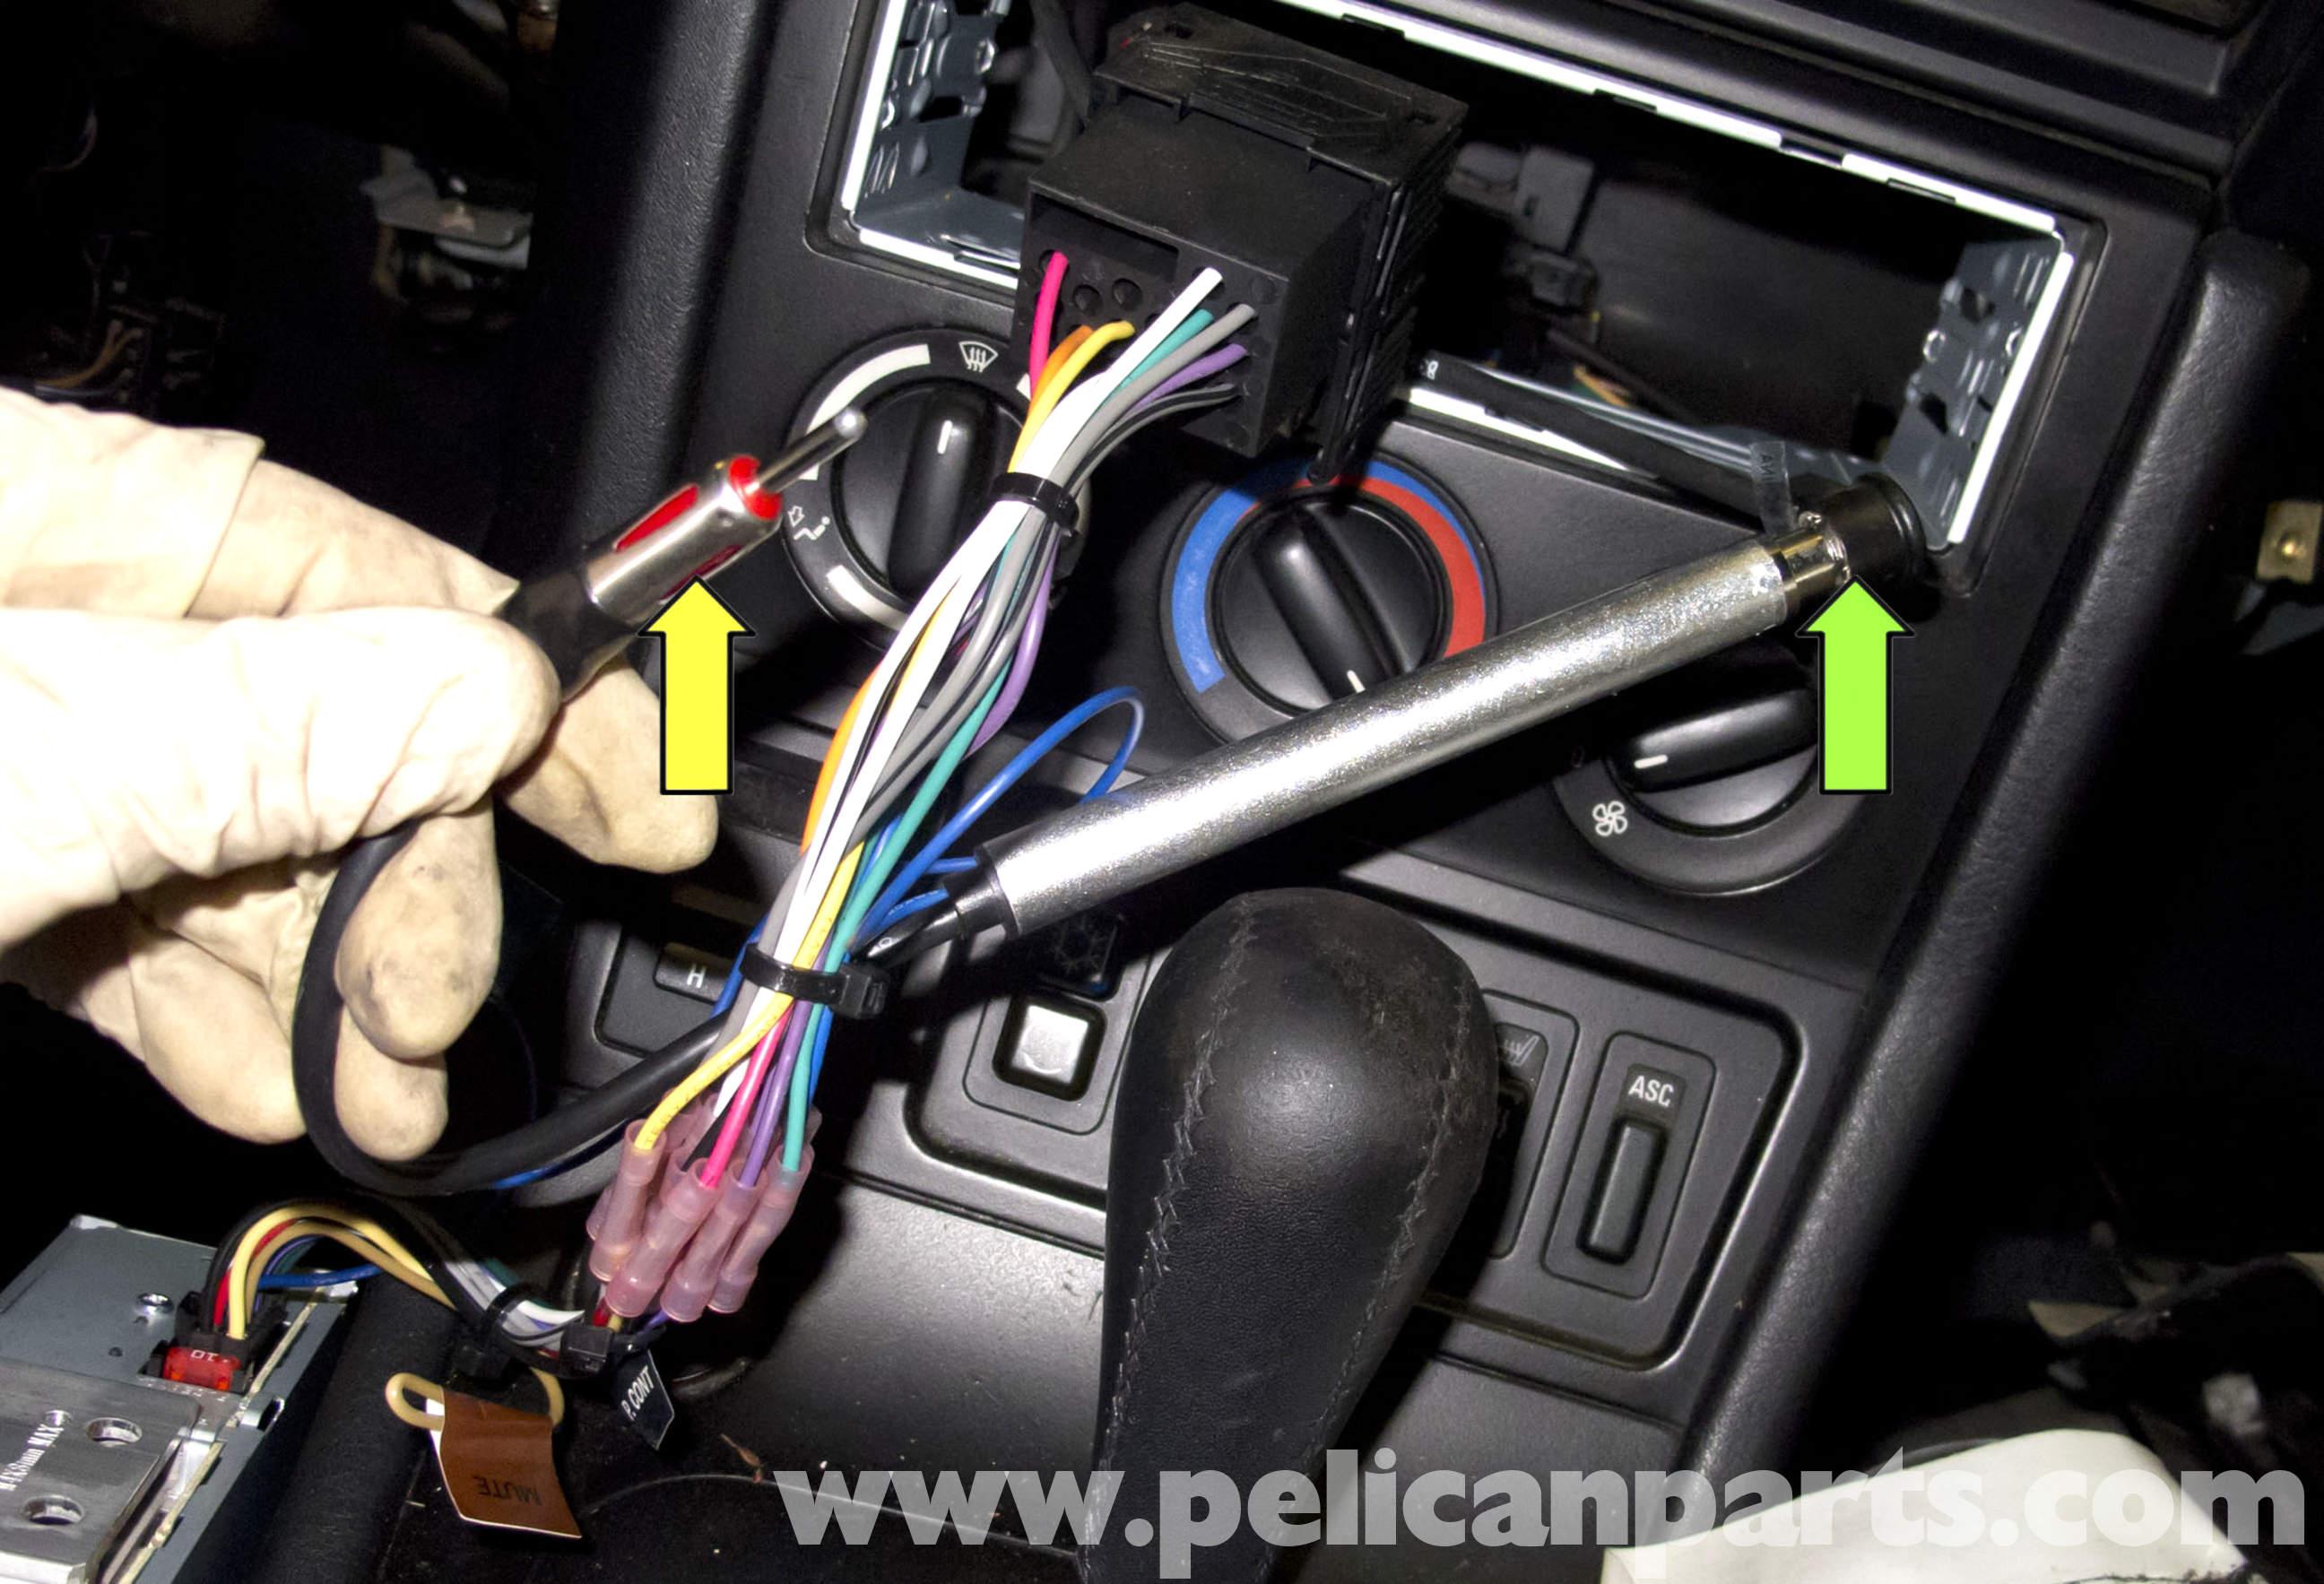 Wiring Diagram Also 1999 Chrysler 300m Also Honda Civic Radio Wiring